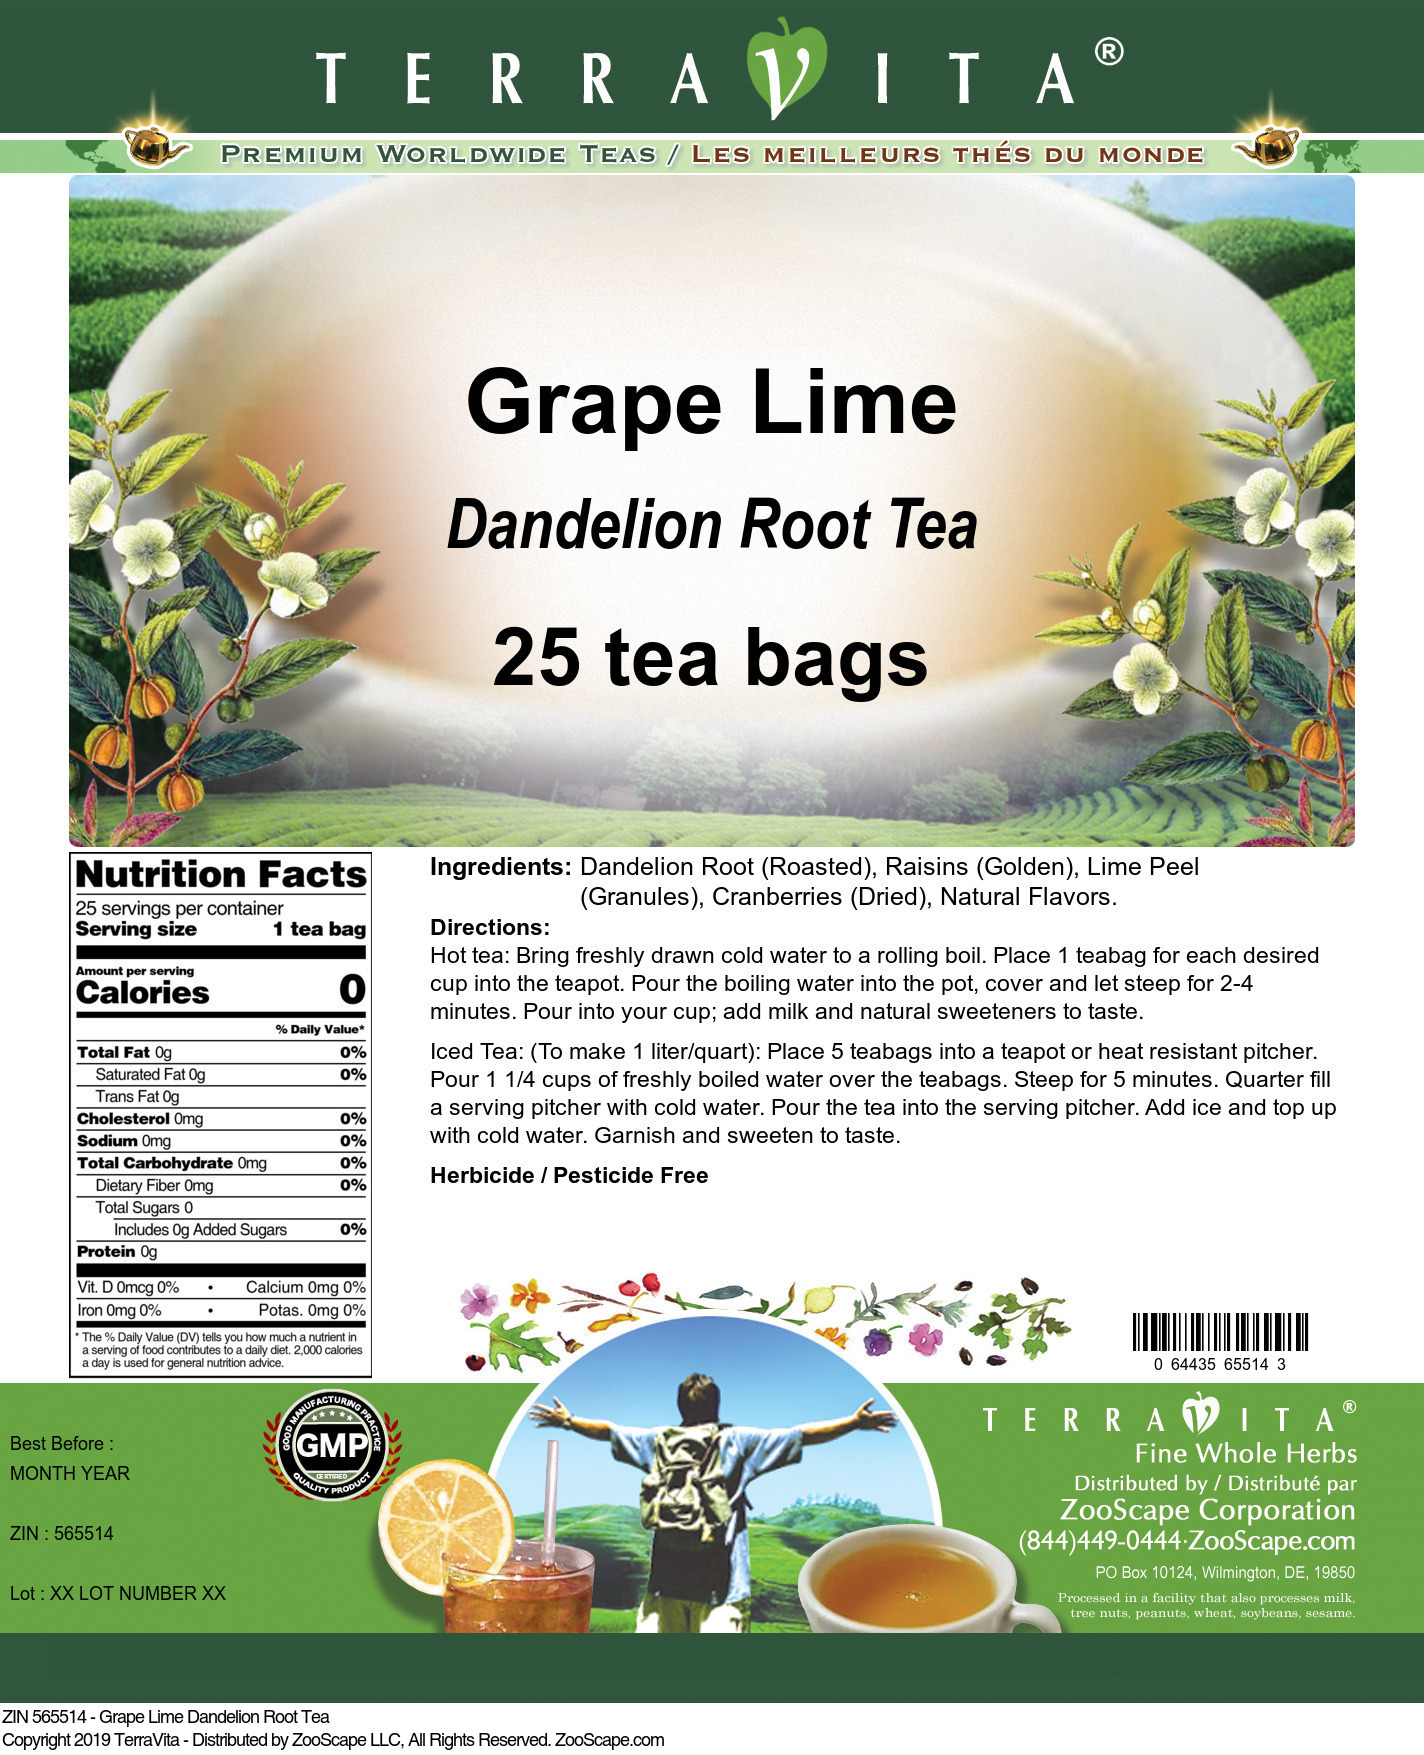 Grape Lime Dandelion Root Tea